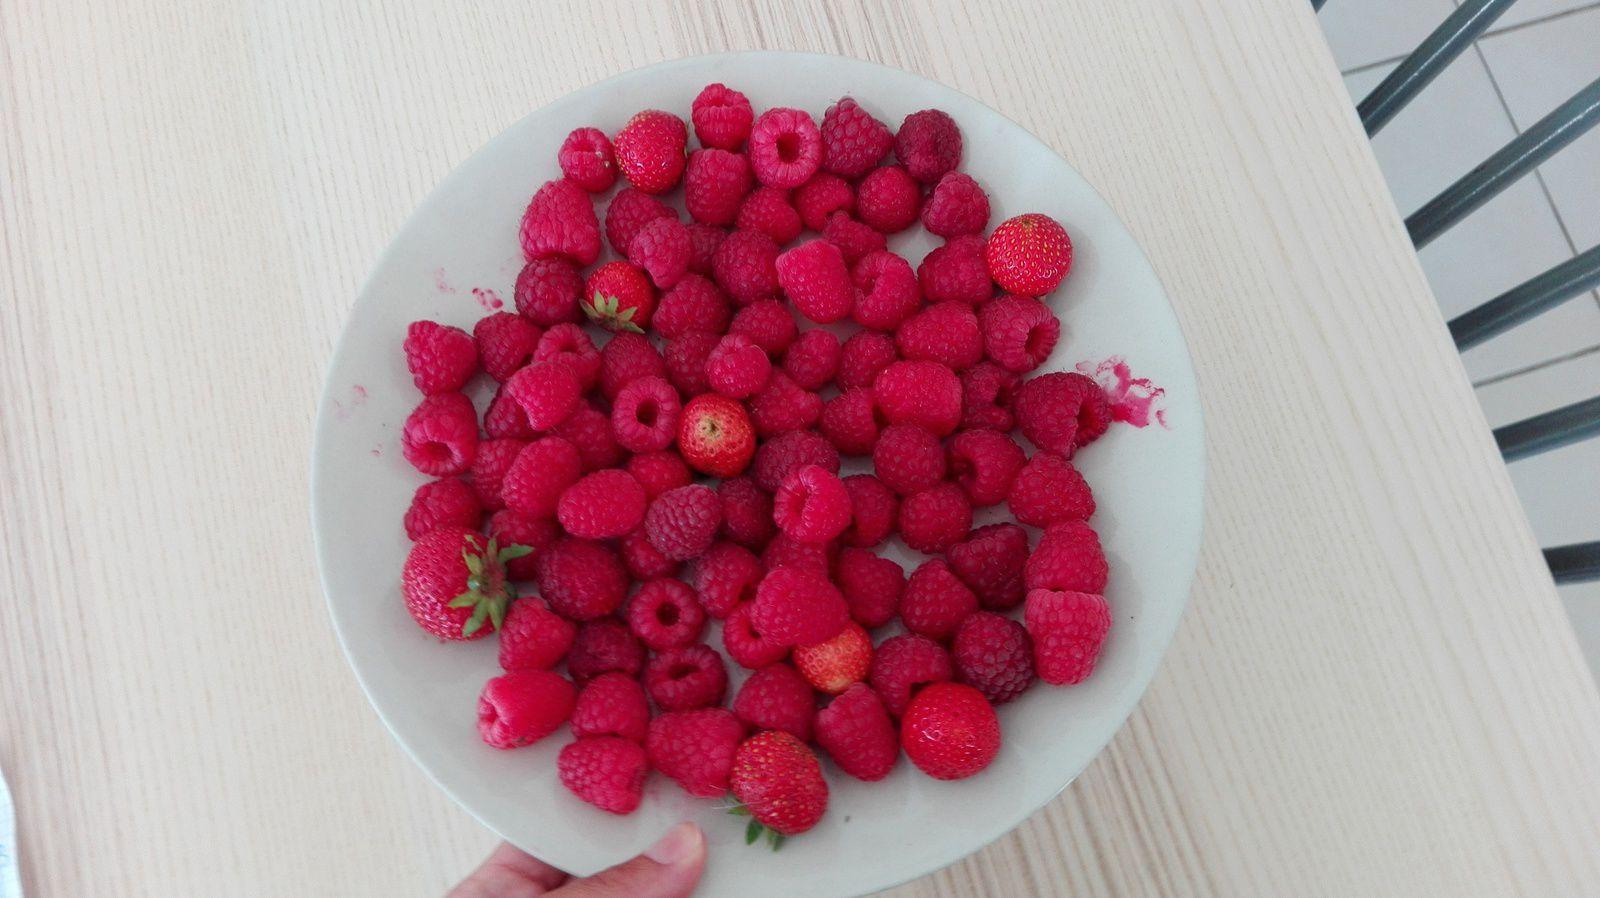 Miam les framboises/fraises du jardin